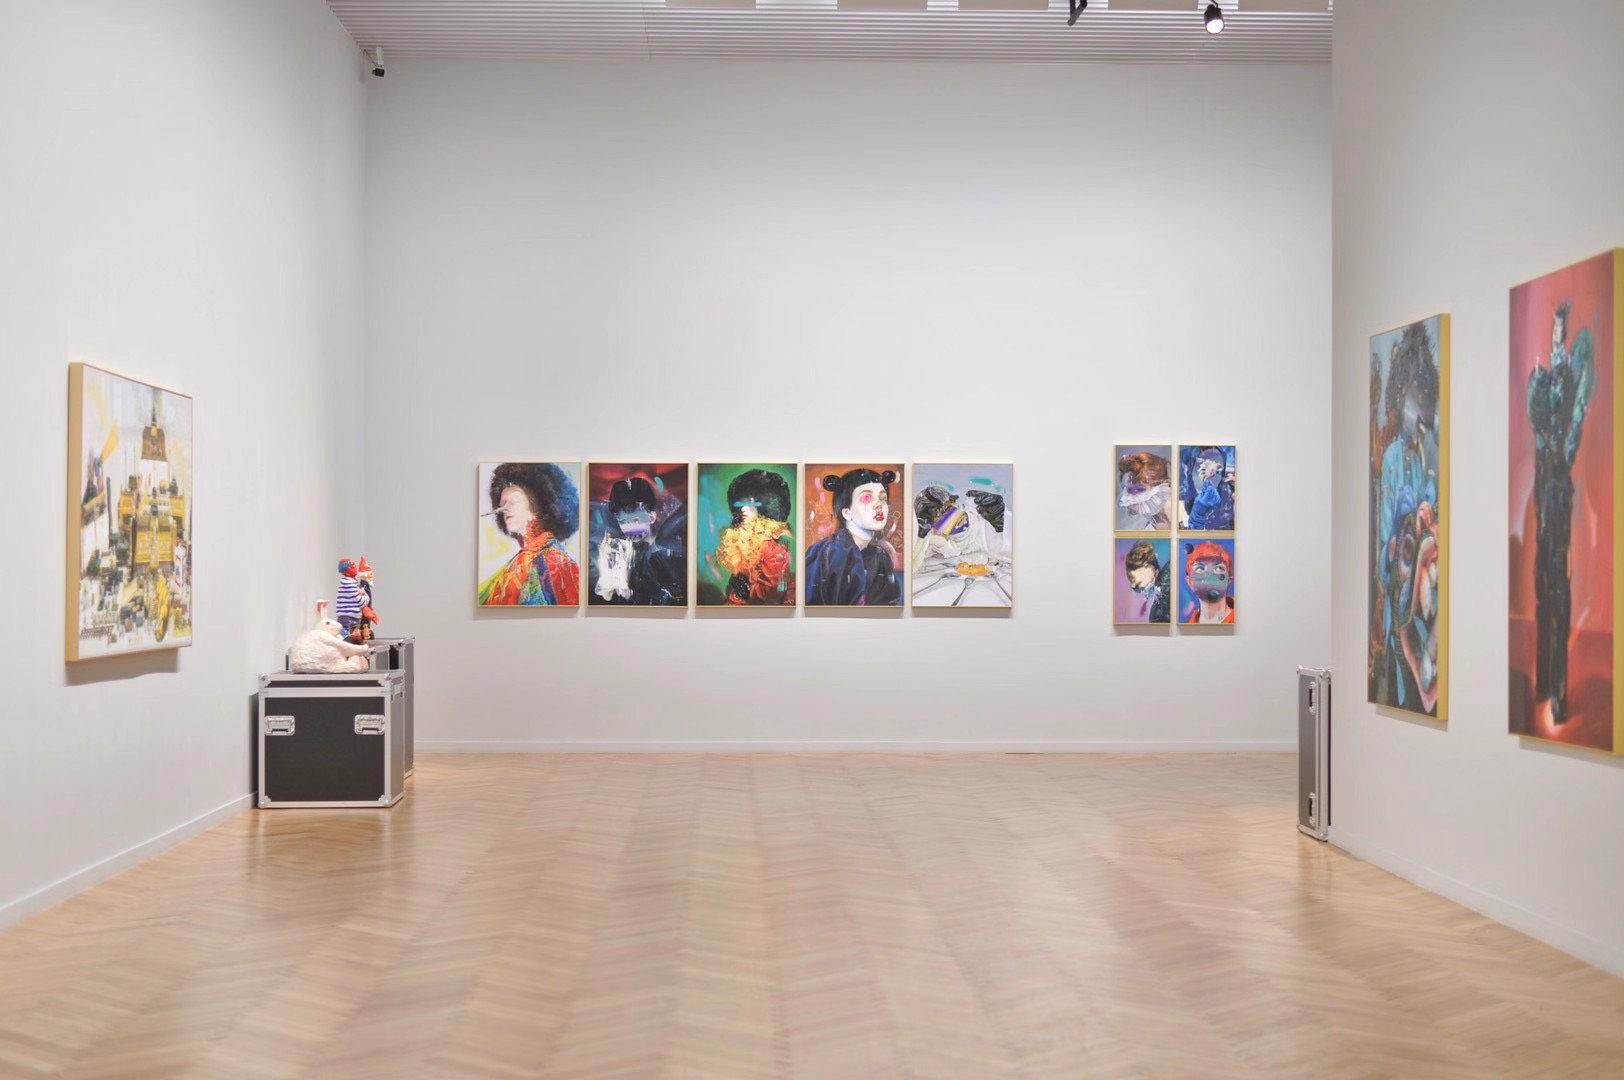 Yibo Gallery